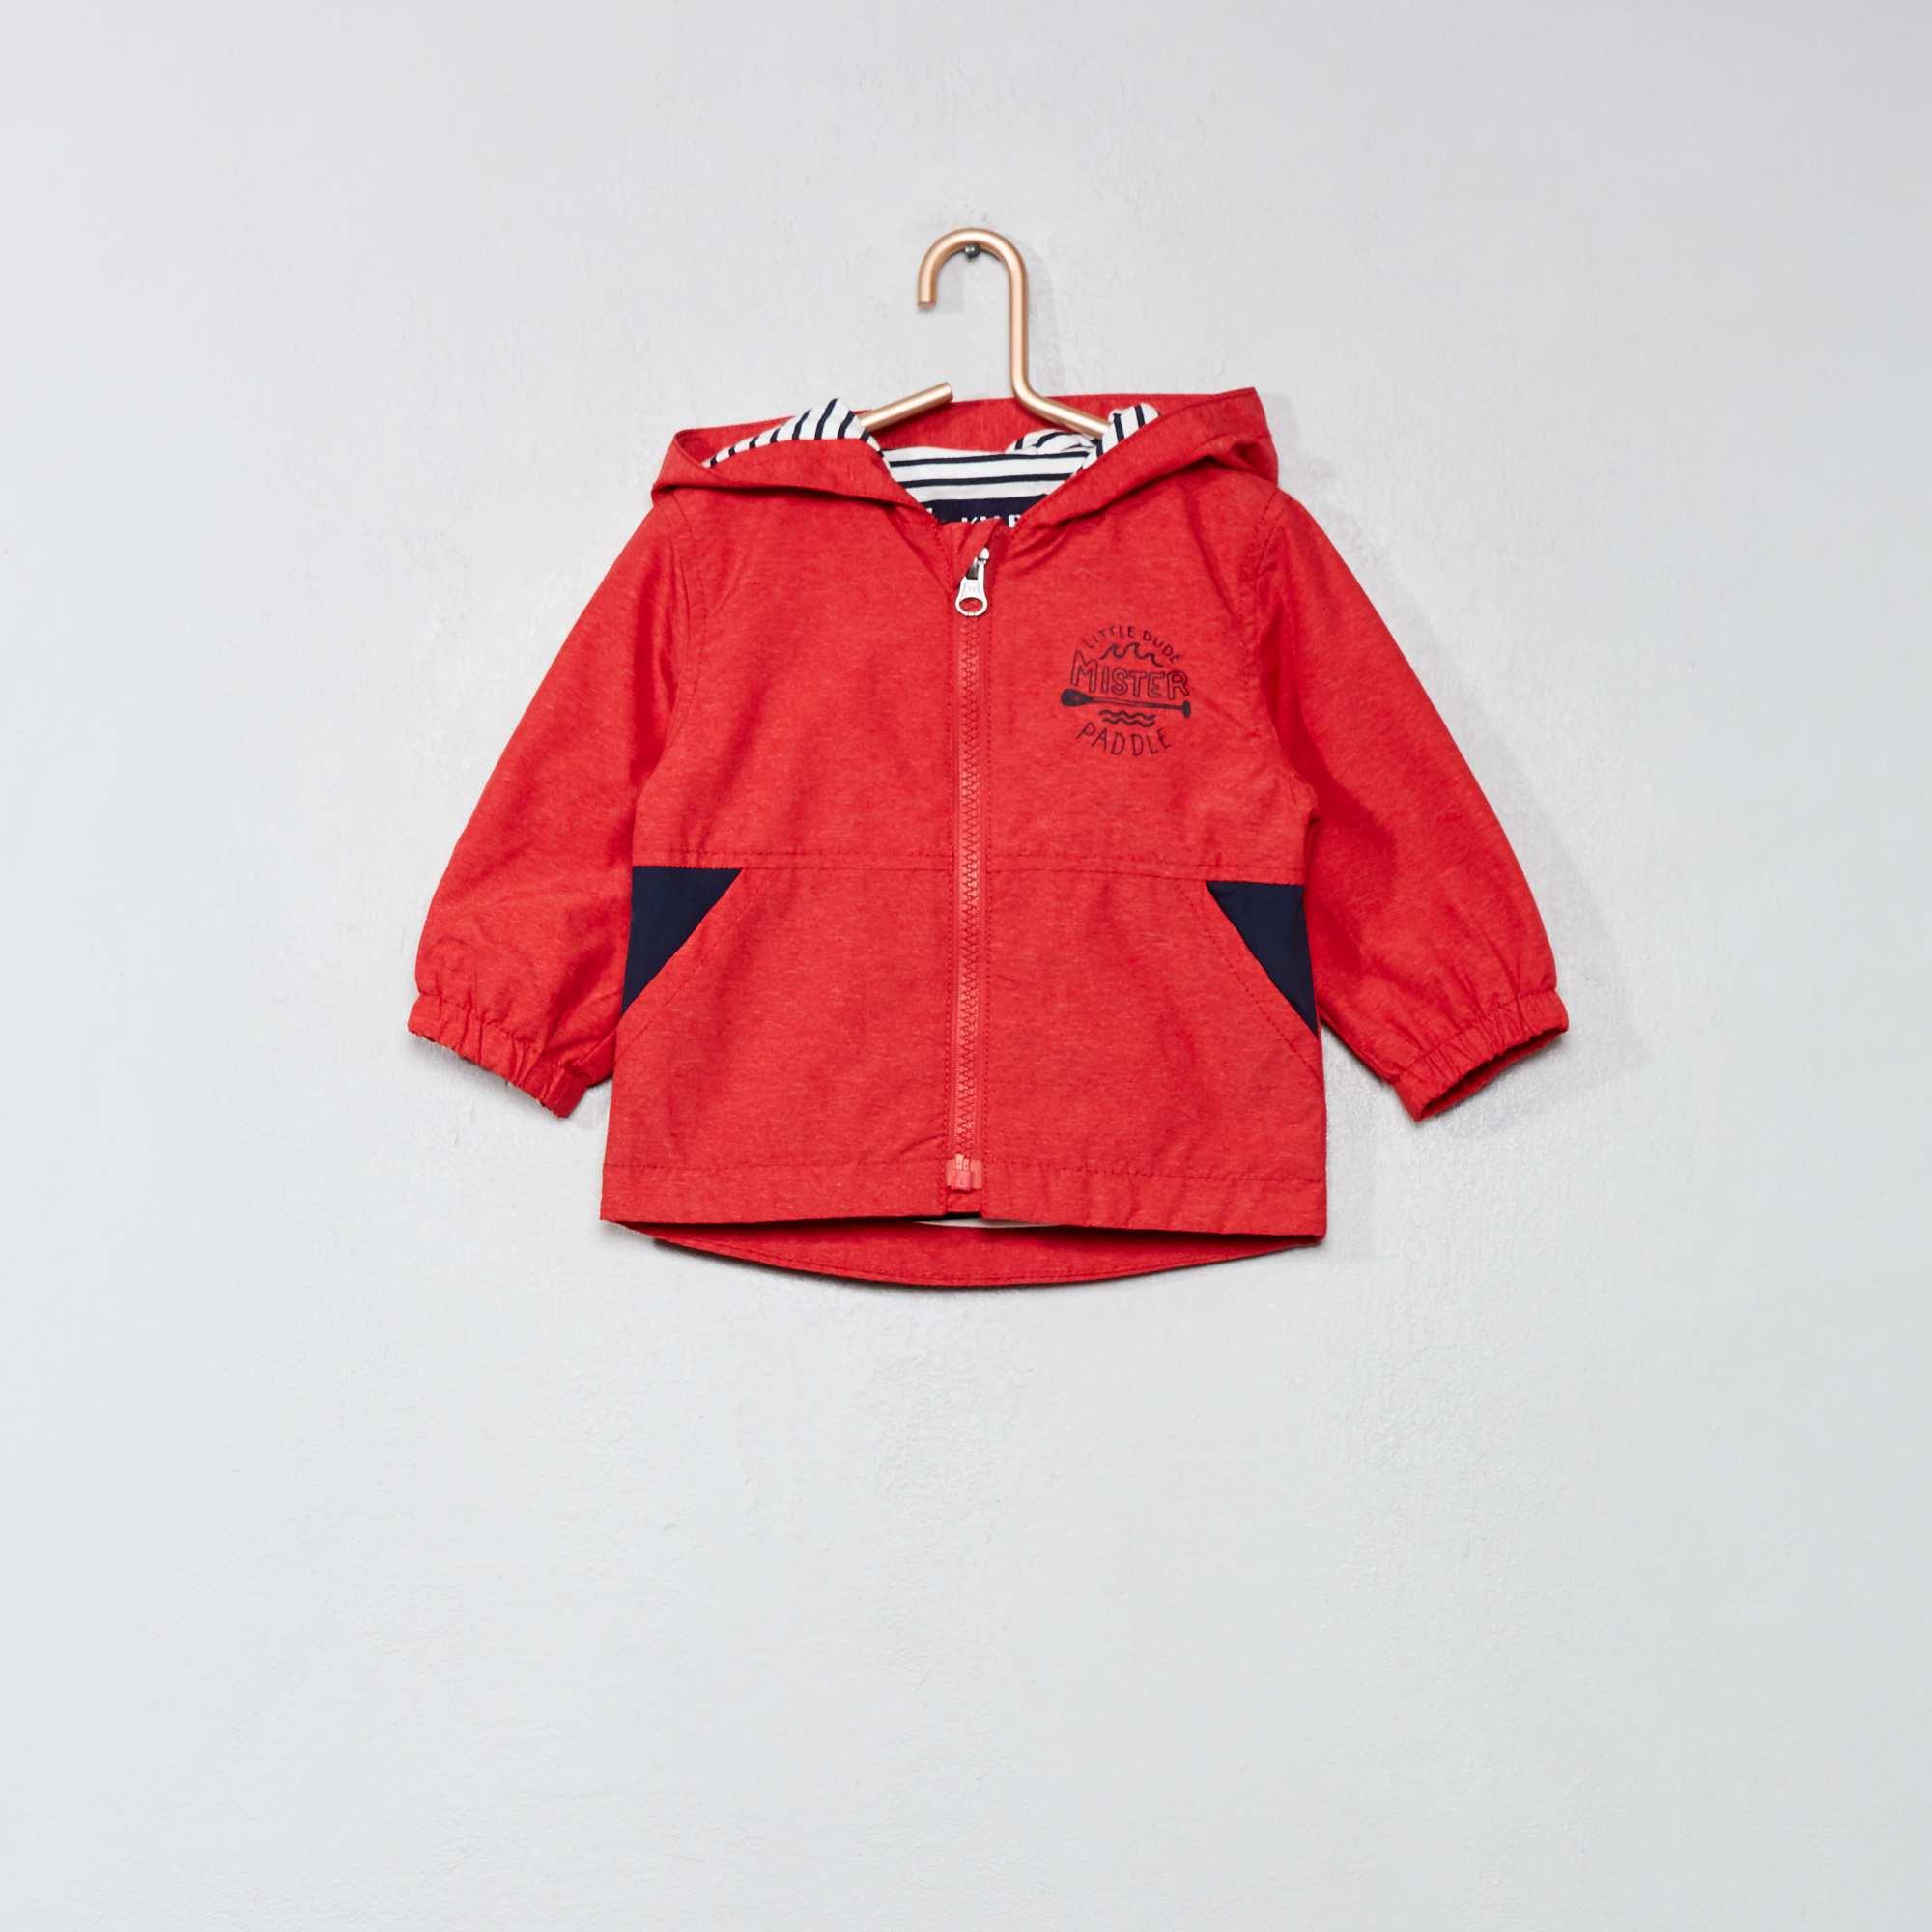 aeb94f00caa11 Blouson coupe-vent Bébé garçon - rouge - Kiabi - 10